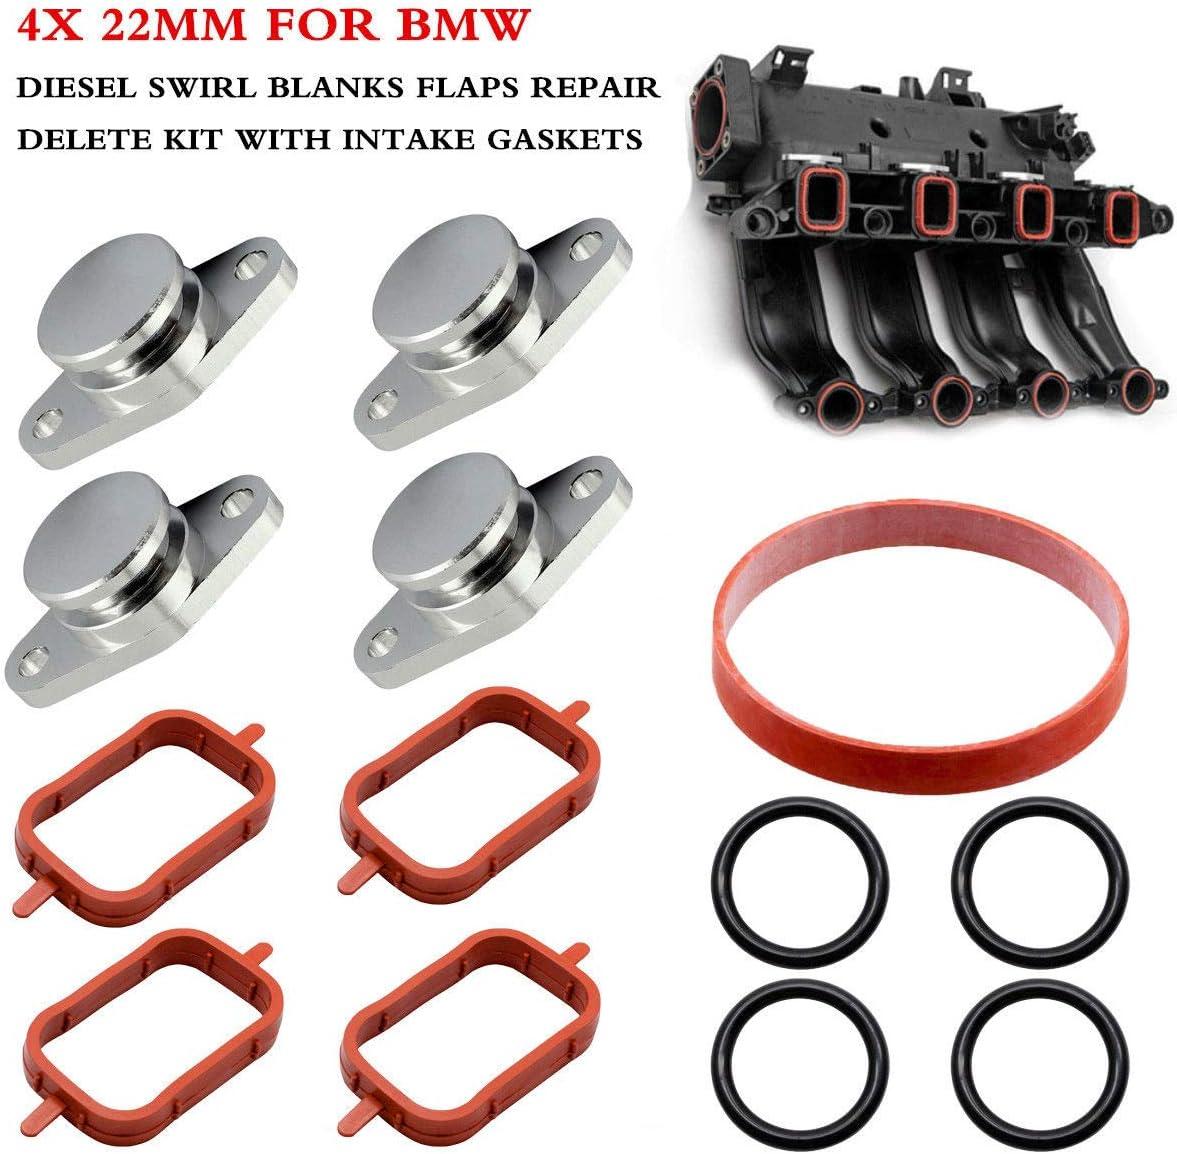 4x 22mm Diesel Swirl Flap Removal Blanks Gasket For BMW 320d 330d 520d 525d 530d